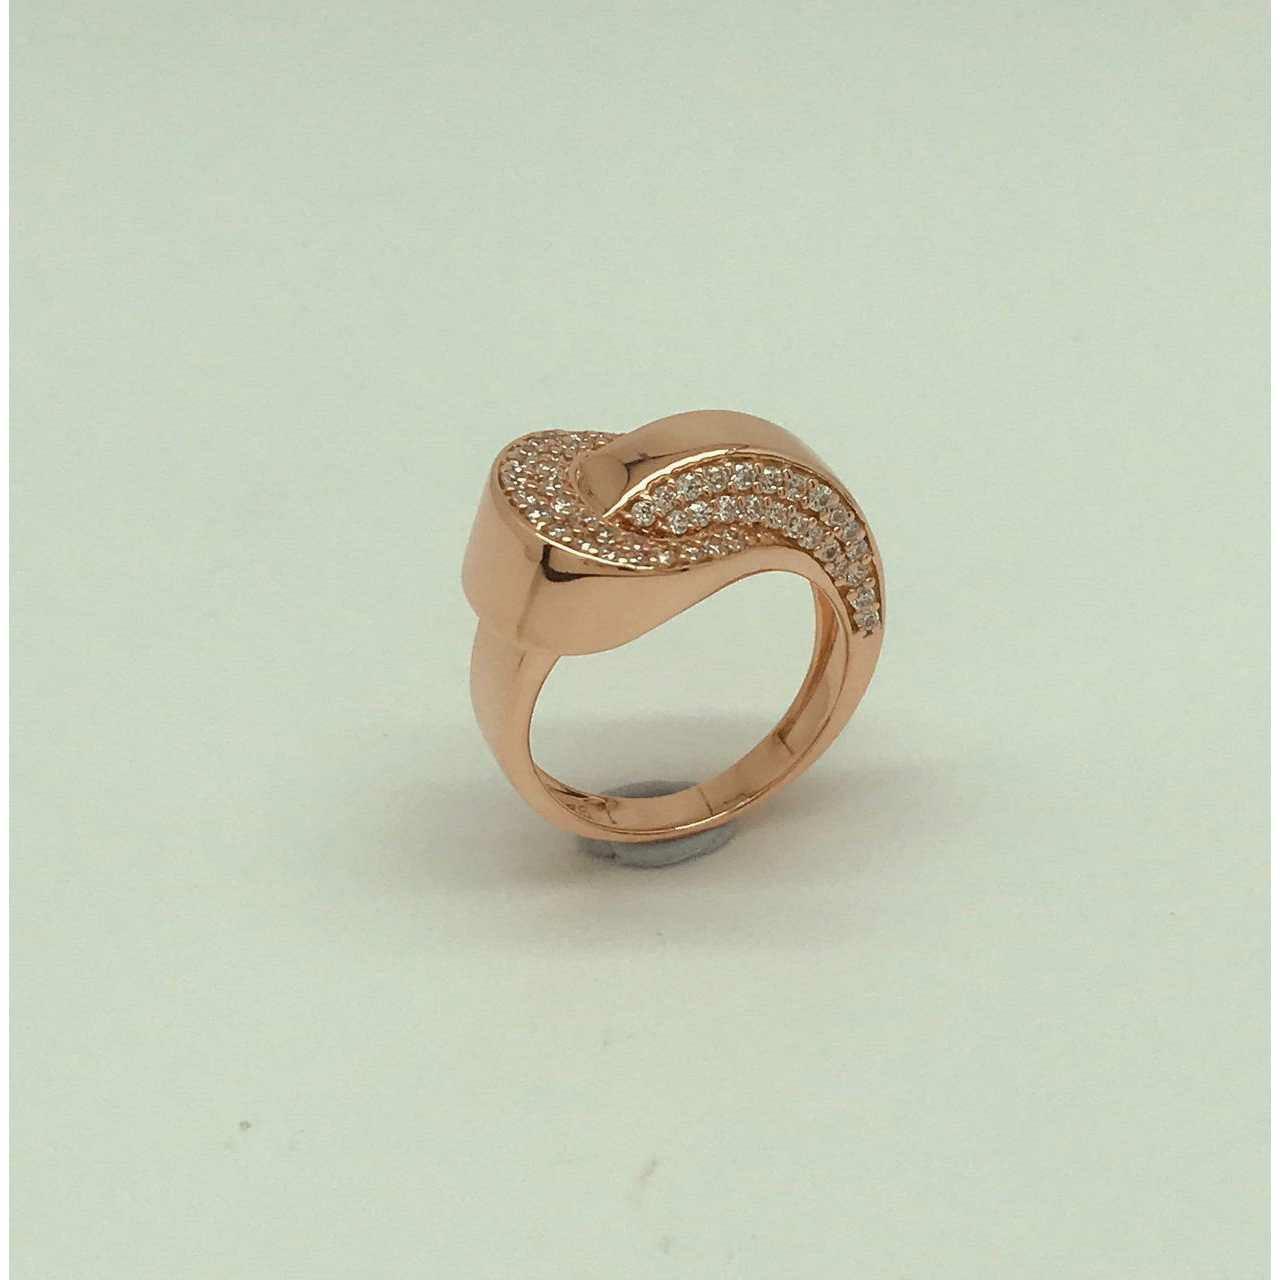 Micro Dimond Golden Finish Ring Ms- 4049